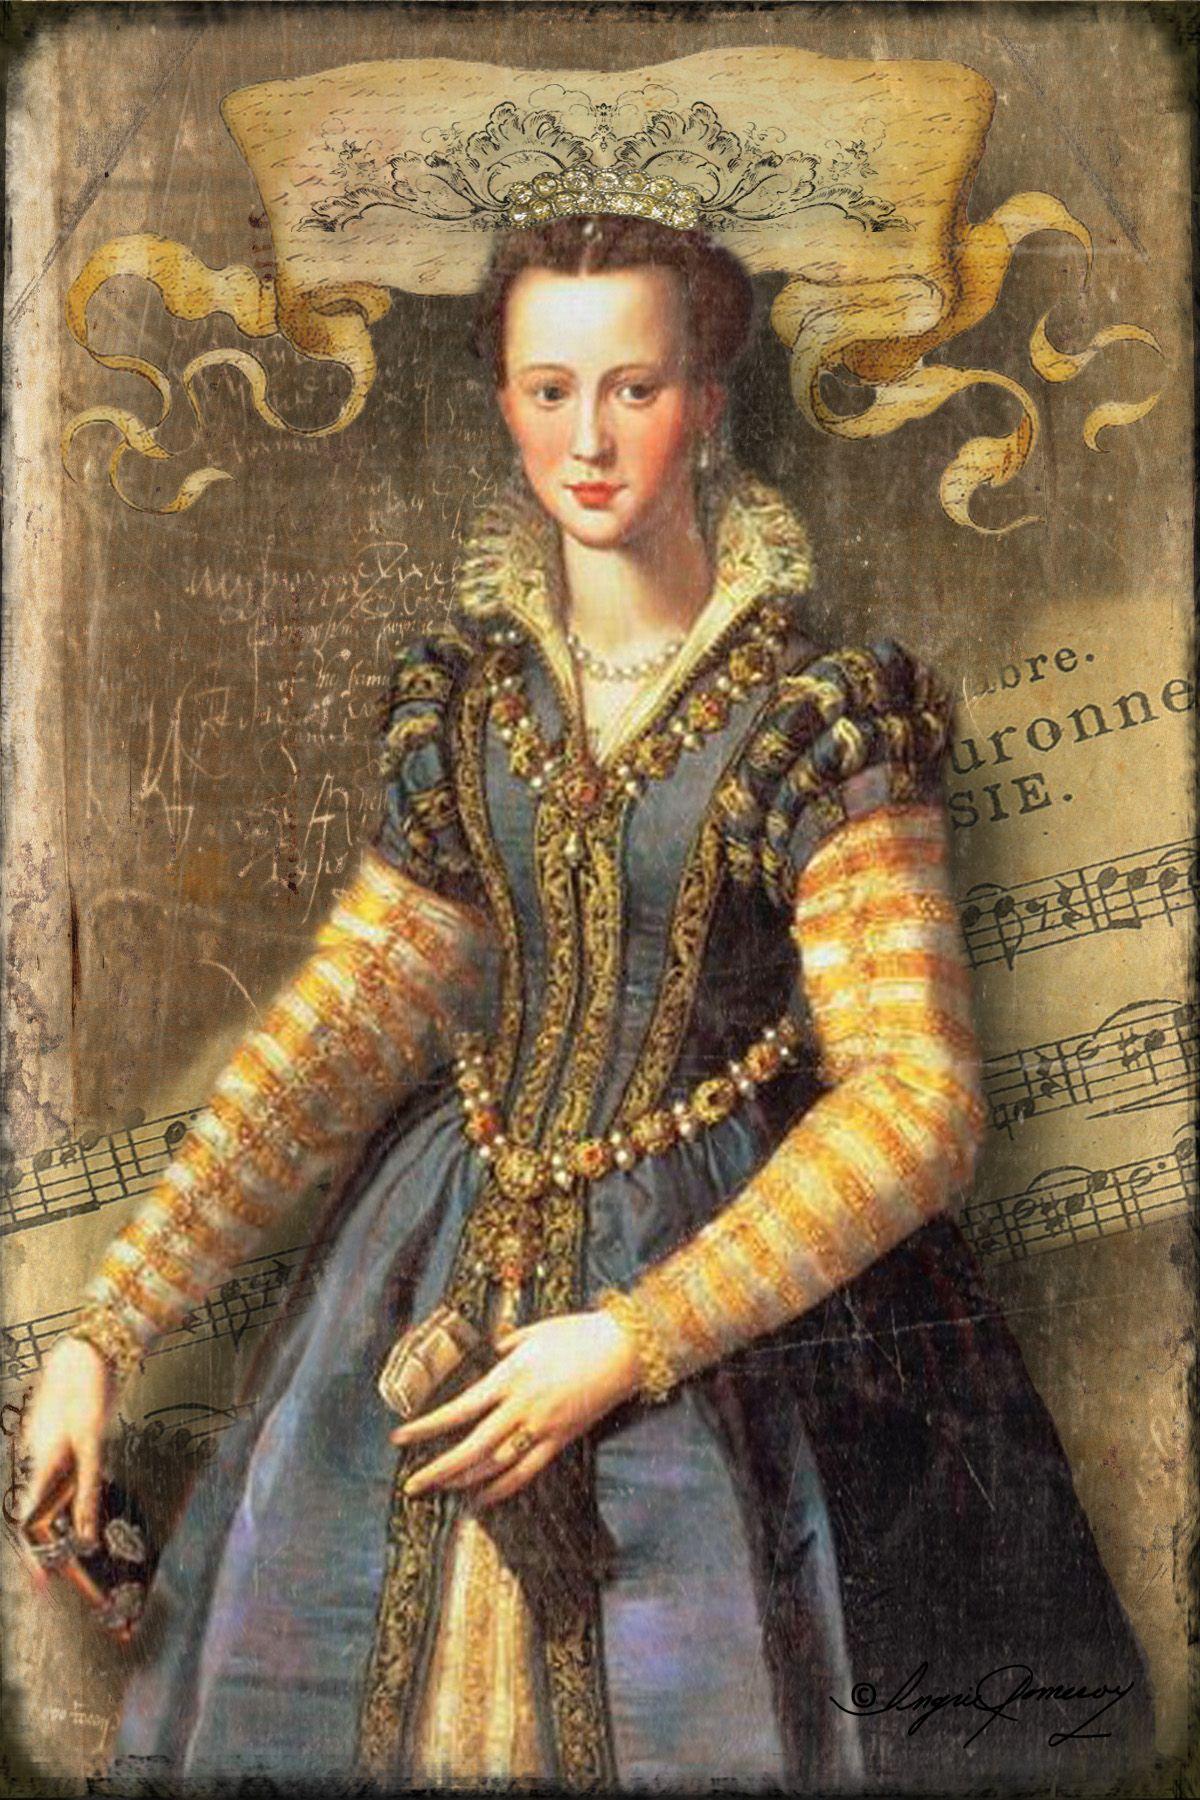 Another Renaissance Maiden Renaissance fashion